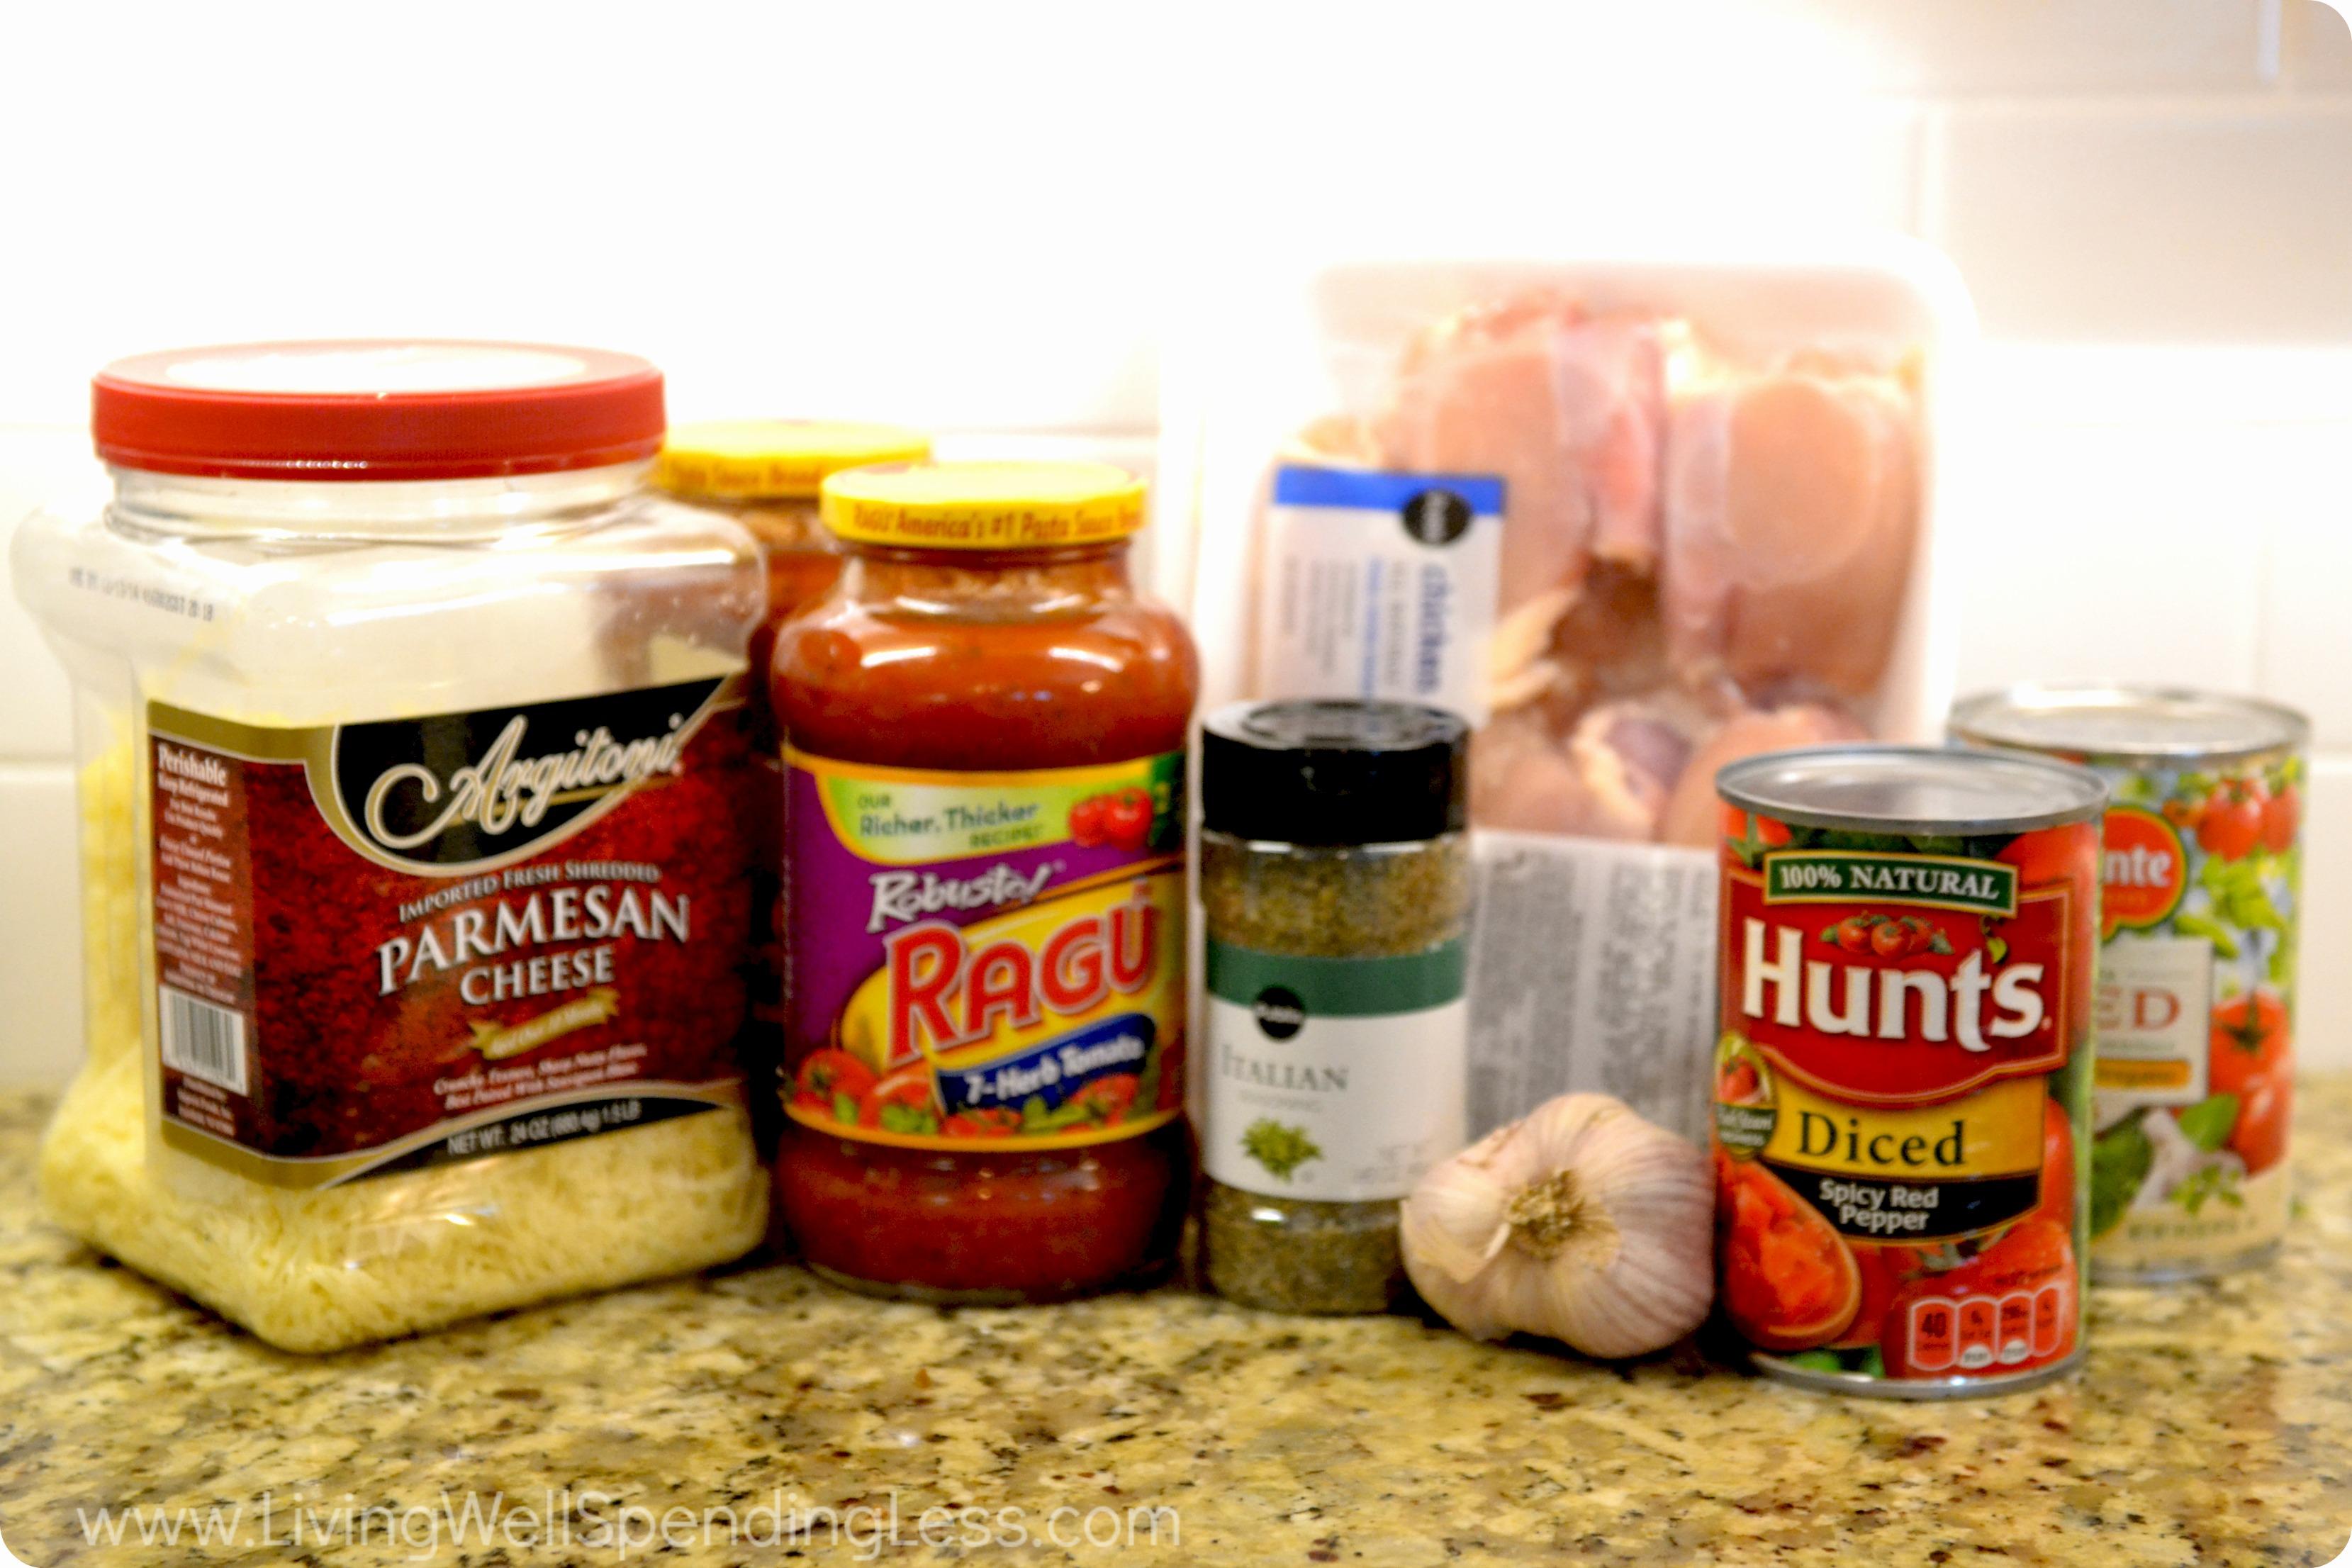 Tomato Parmesan Chicken ingredients.